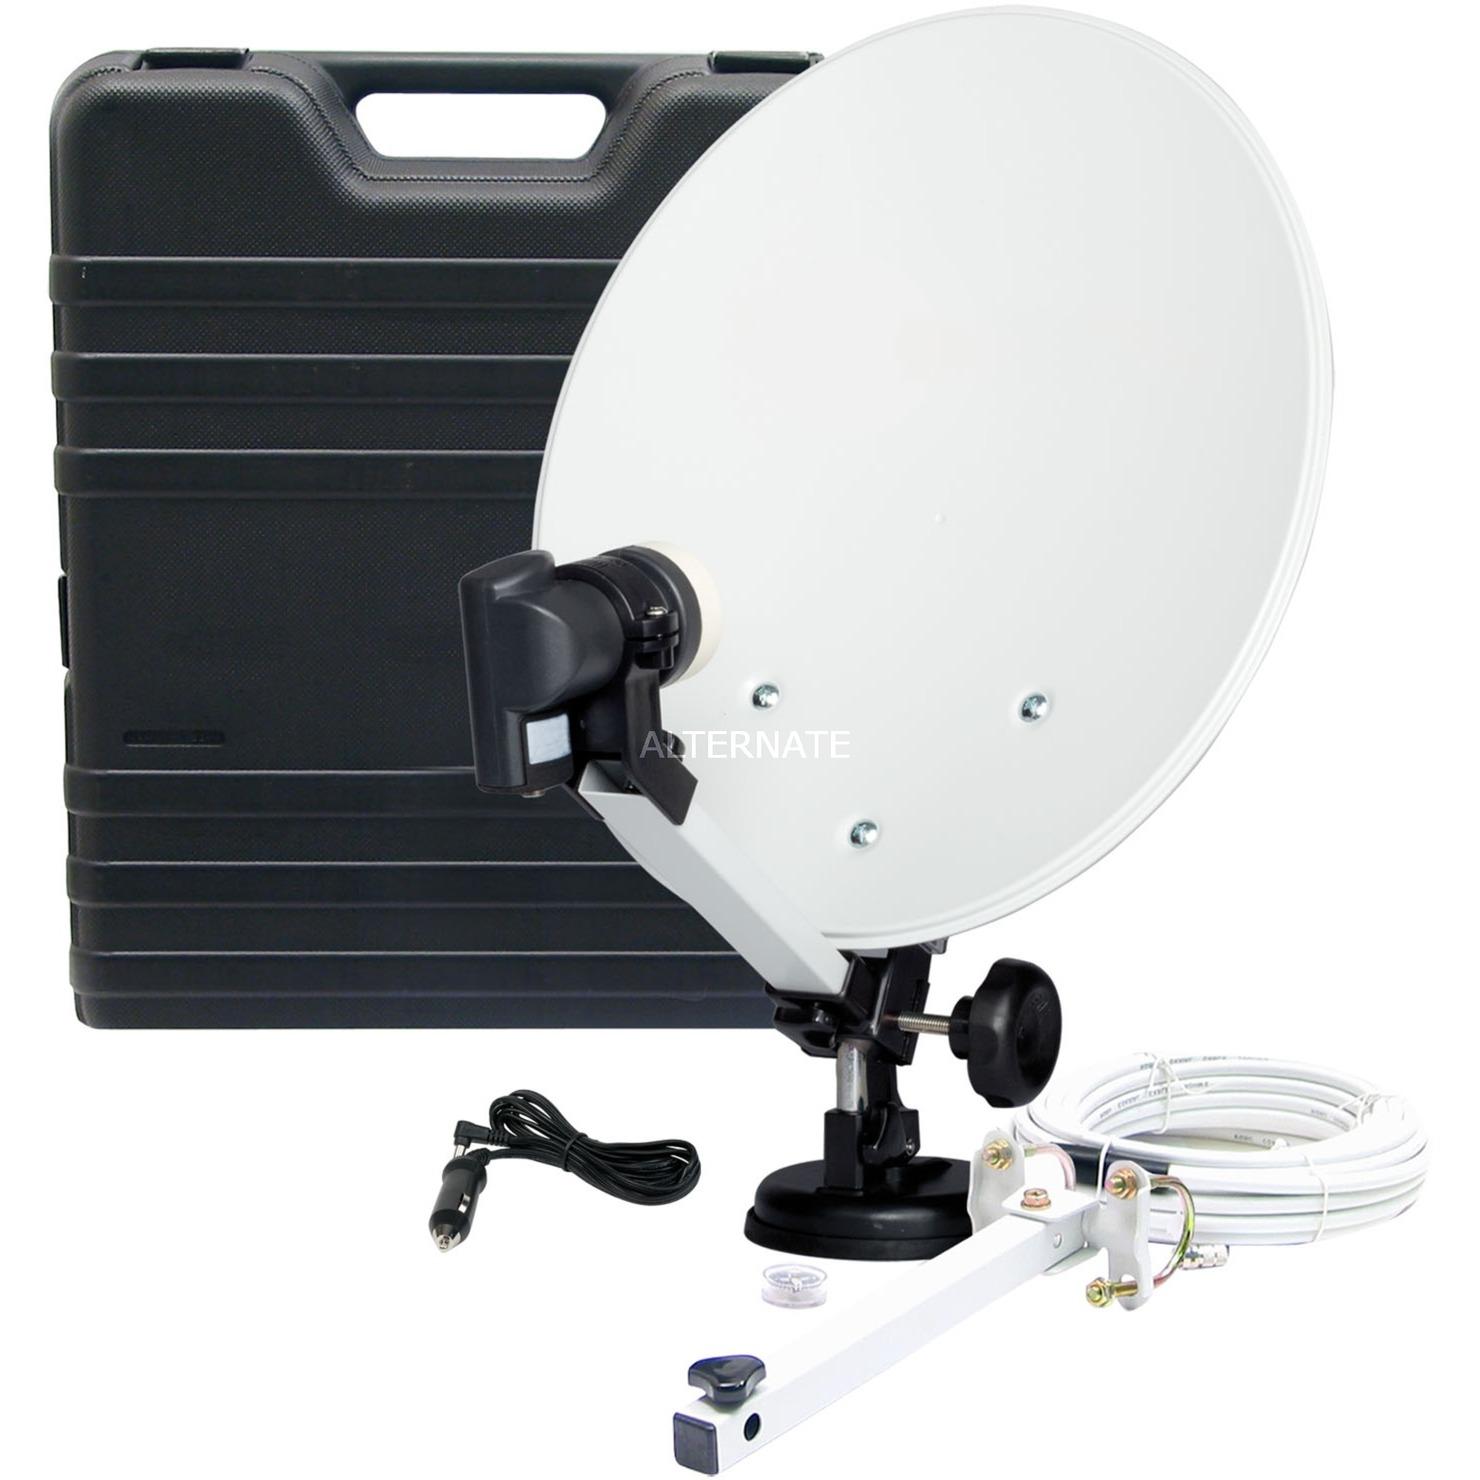 5103309 Blanco antena de satélite, Equipo satélite